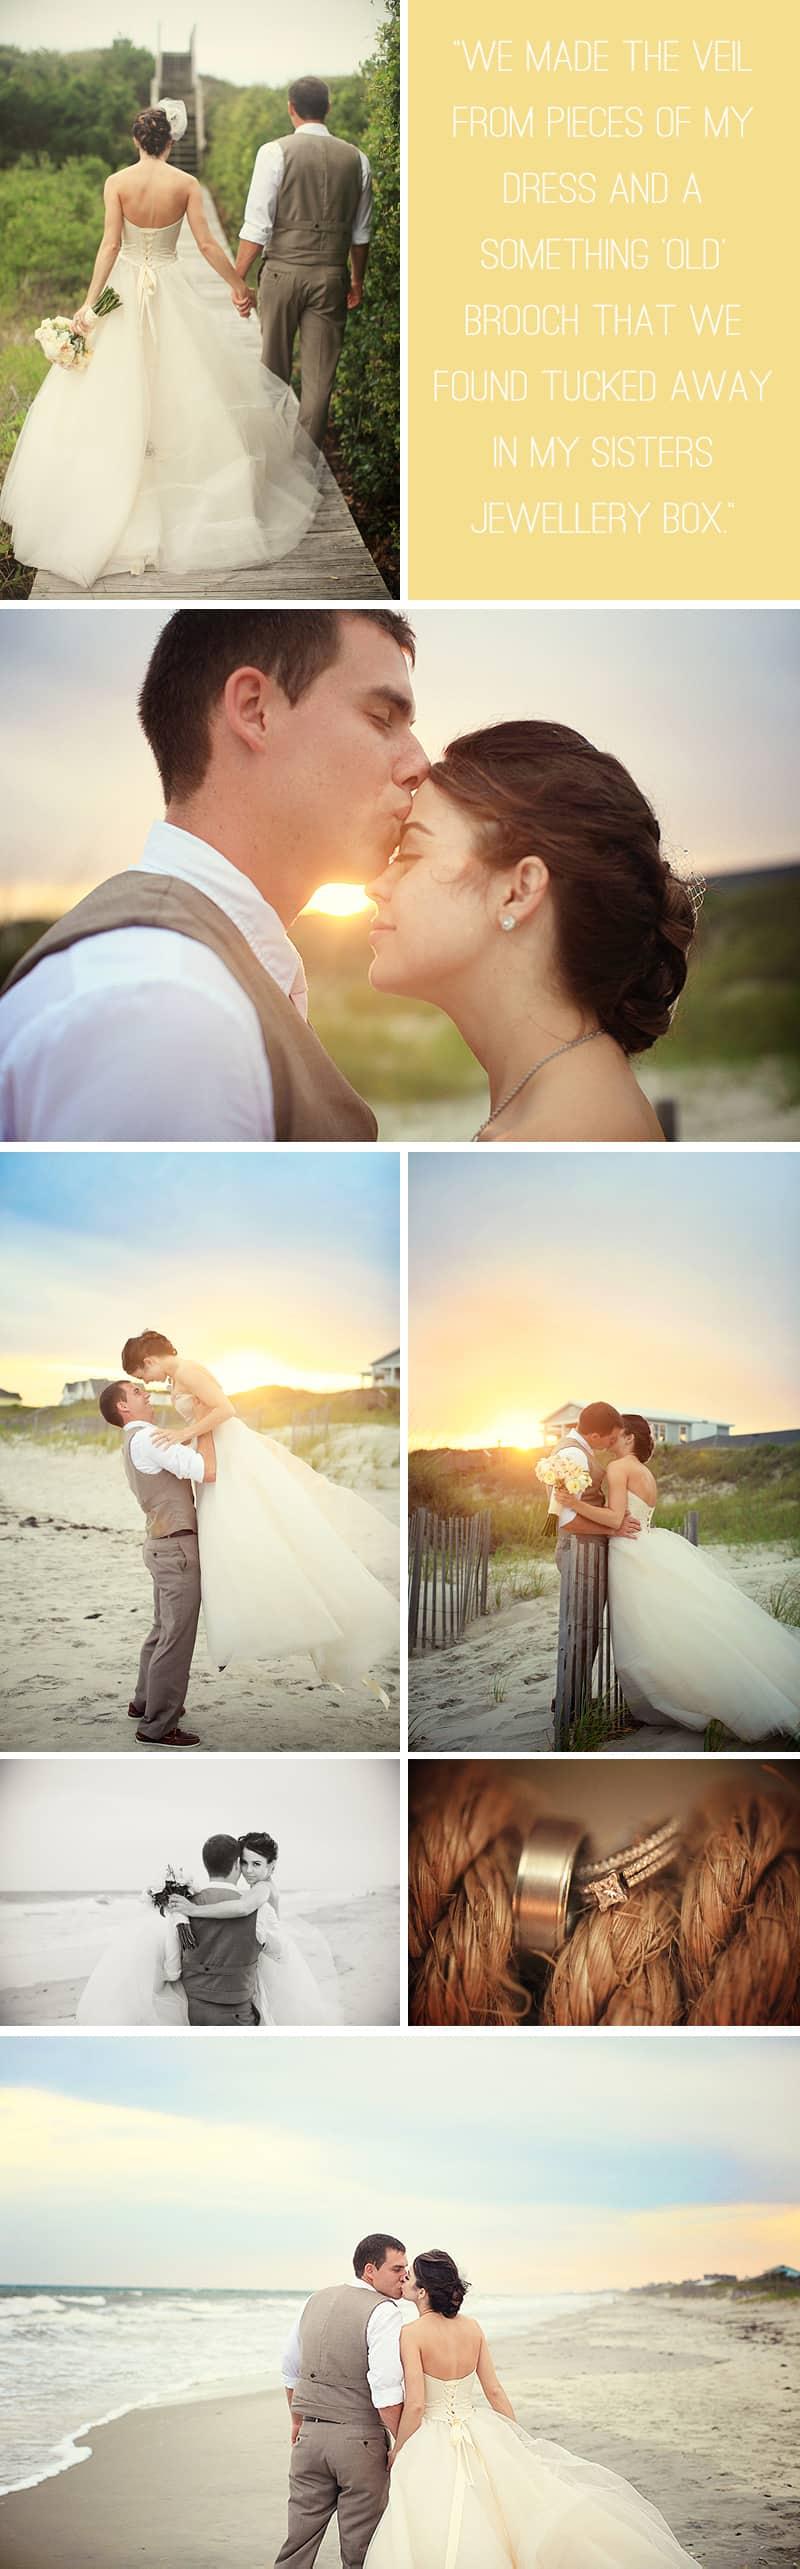 An Intimate Beach Wedding 3